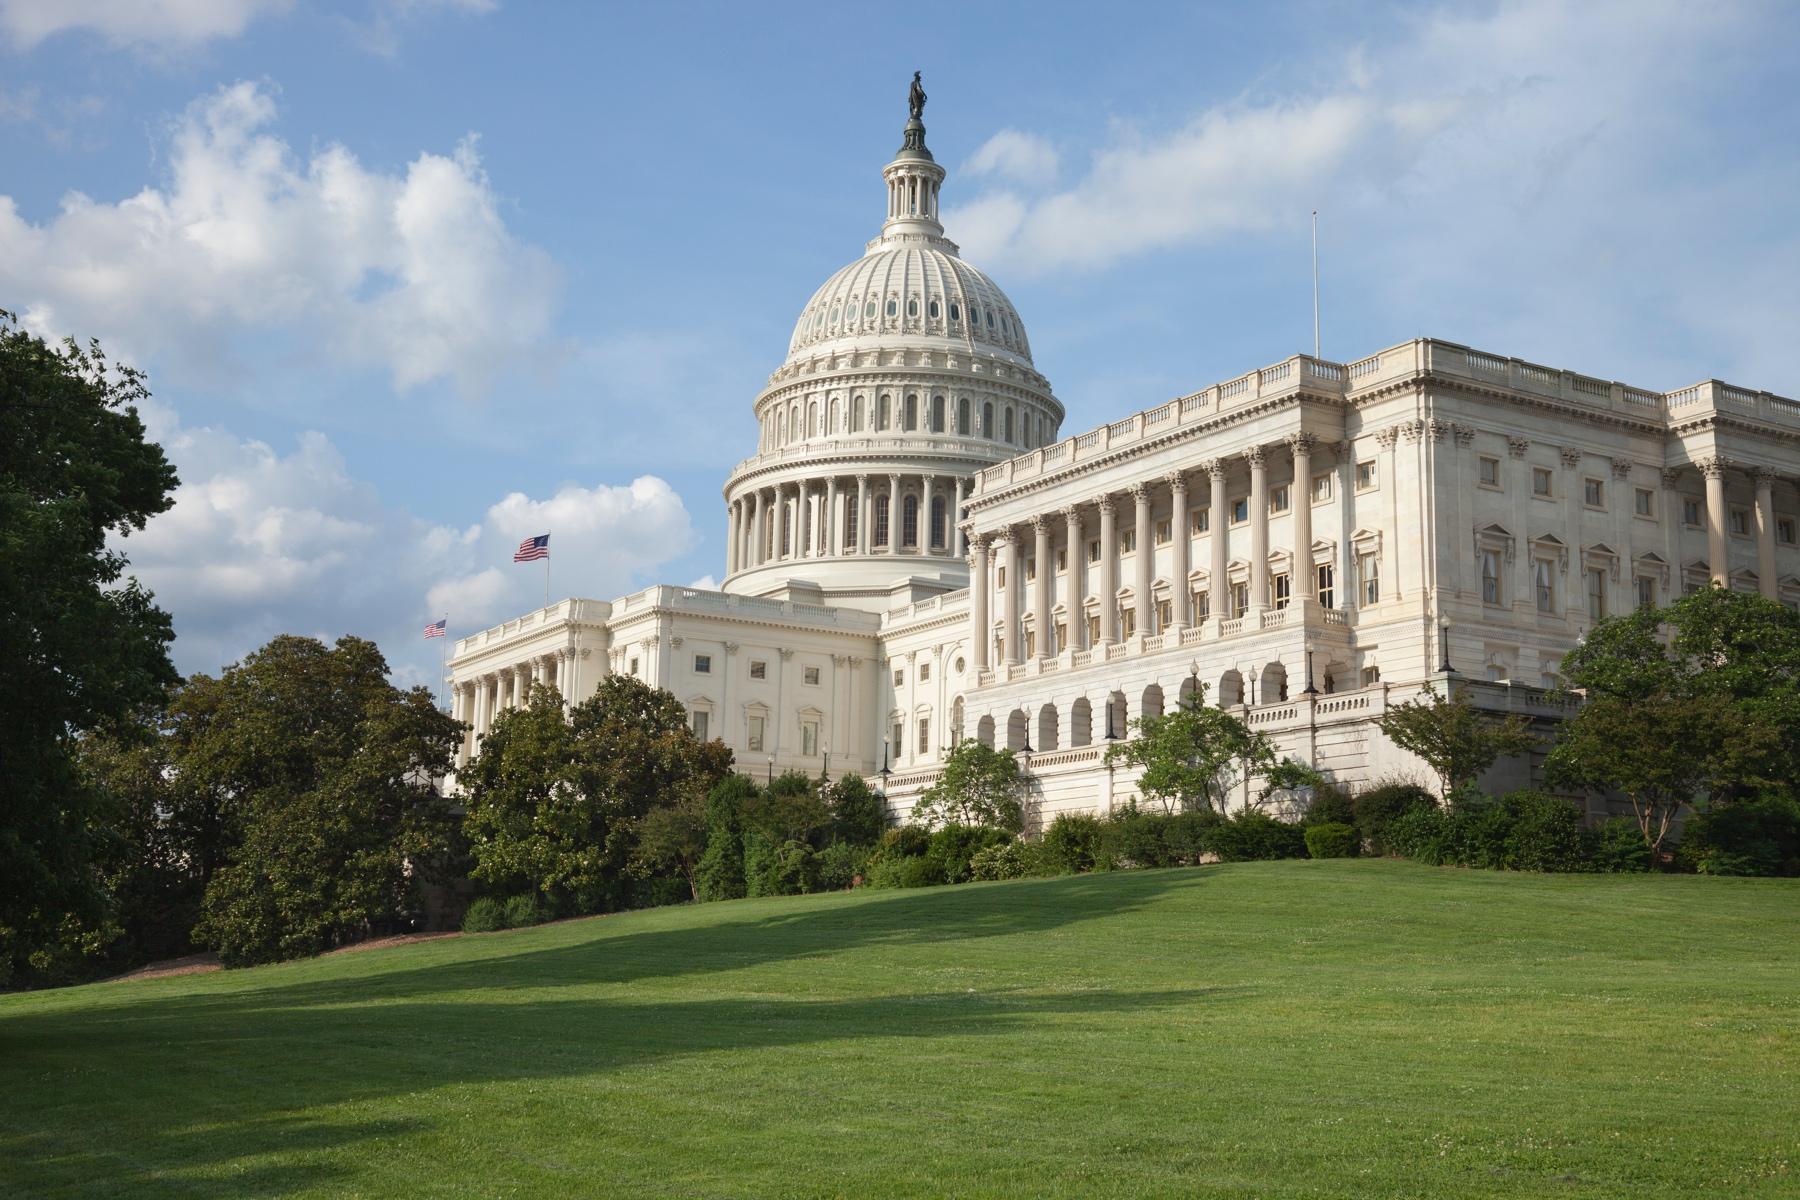 us-capitol-building-PQSLA5Y.jpg